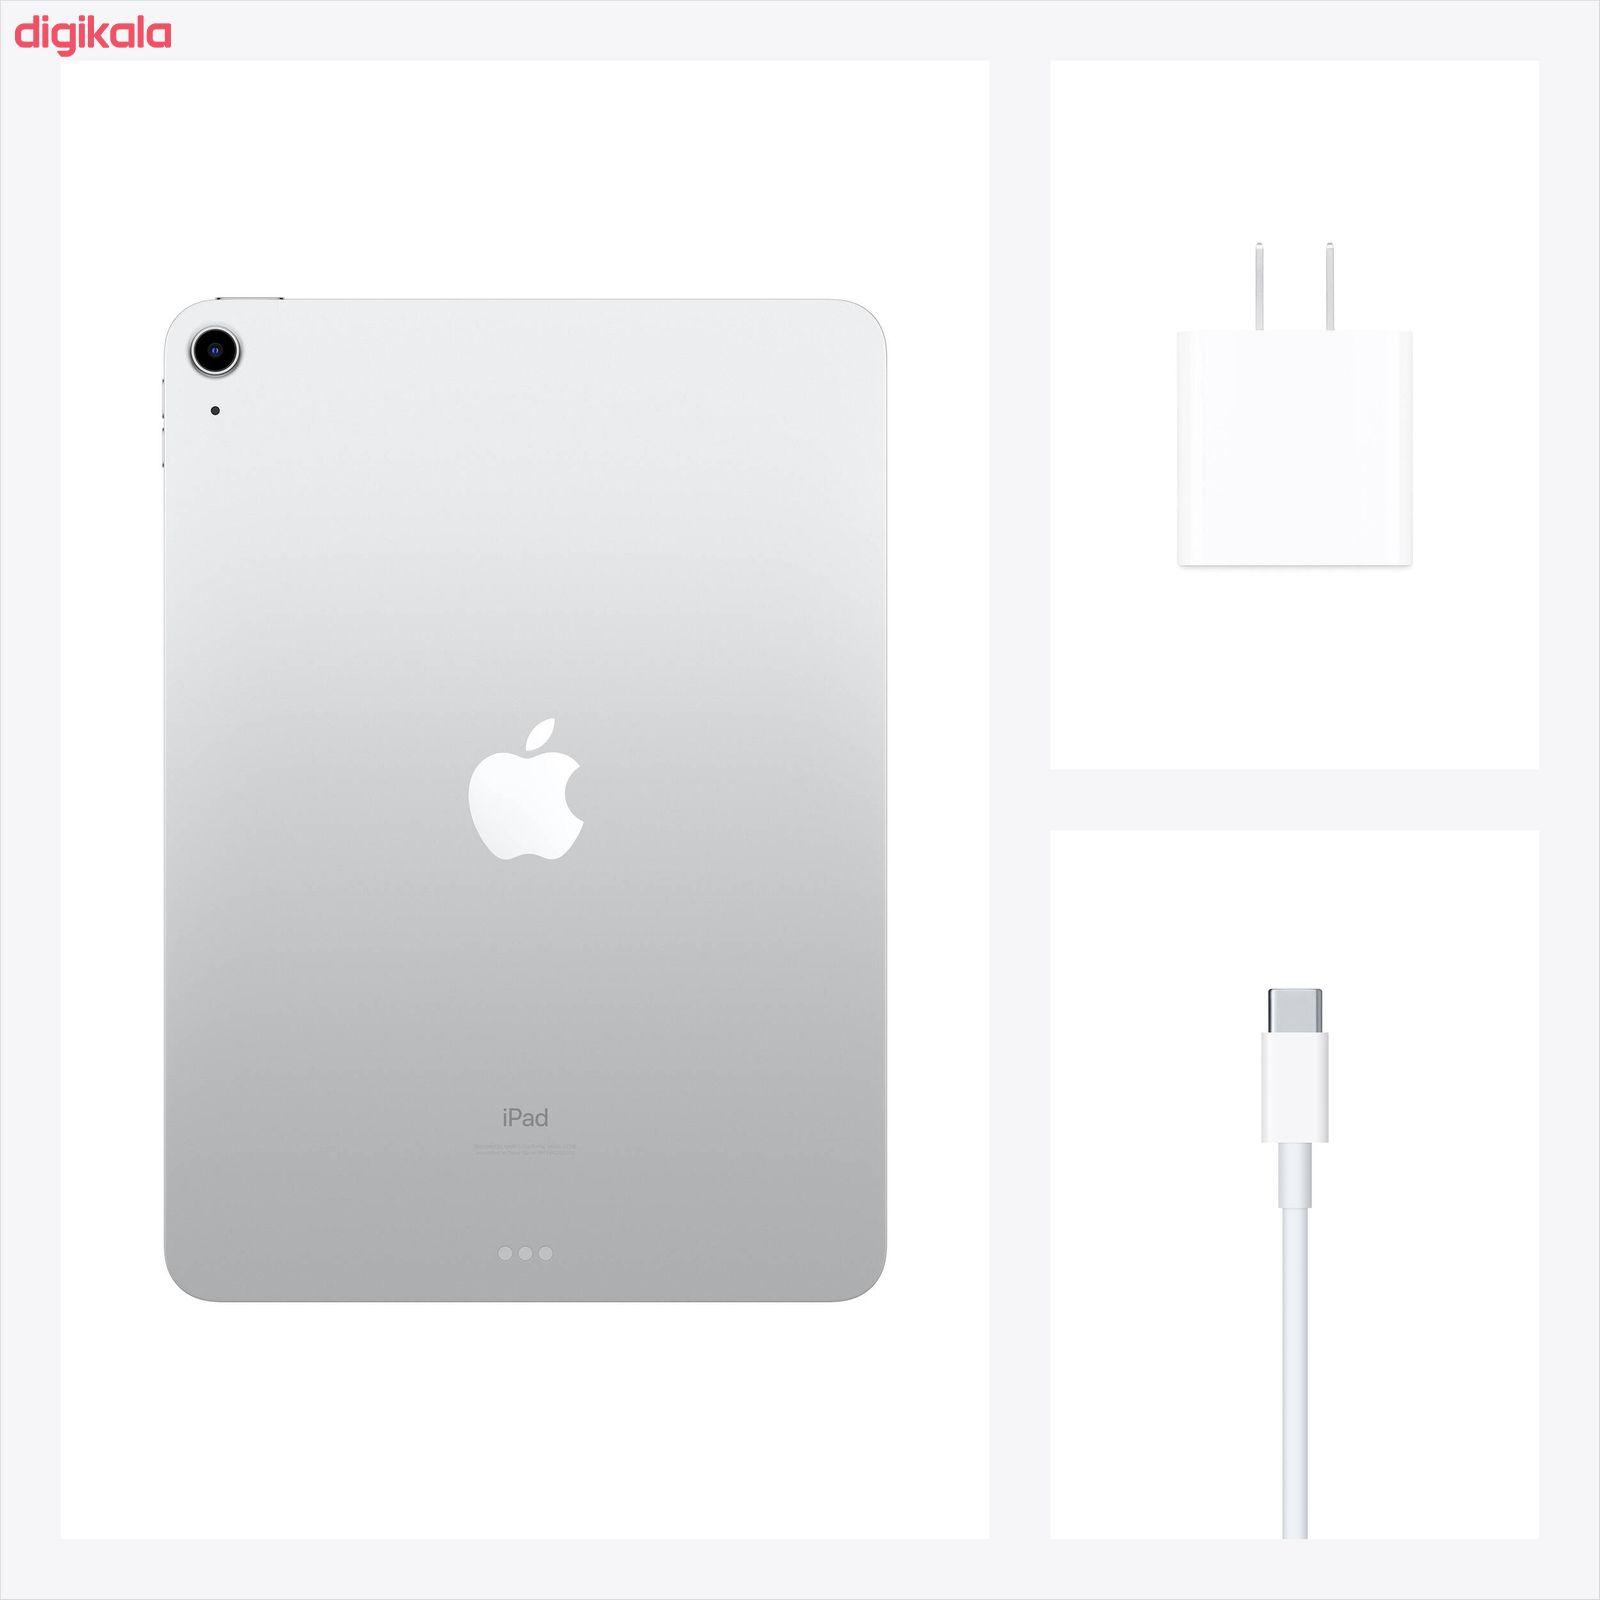 تبلت اپل مدل iPad Air 10.9 inch 2020 WiFi ظرفیت 64 گیگابایت  main 1 15